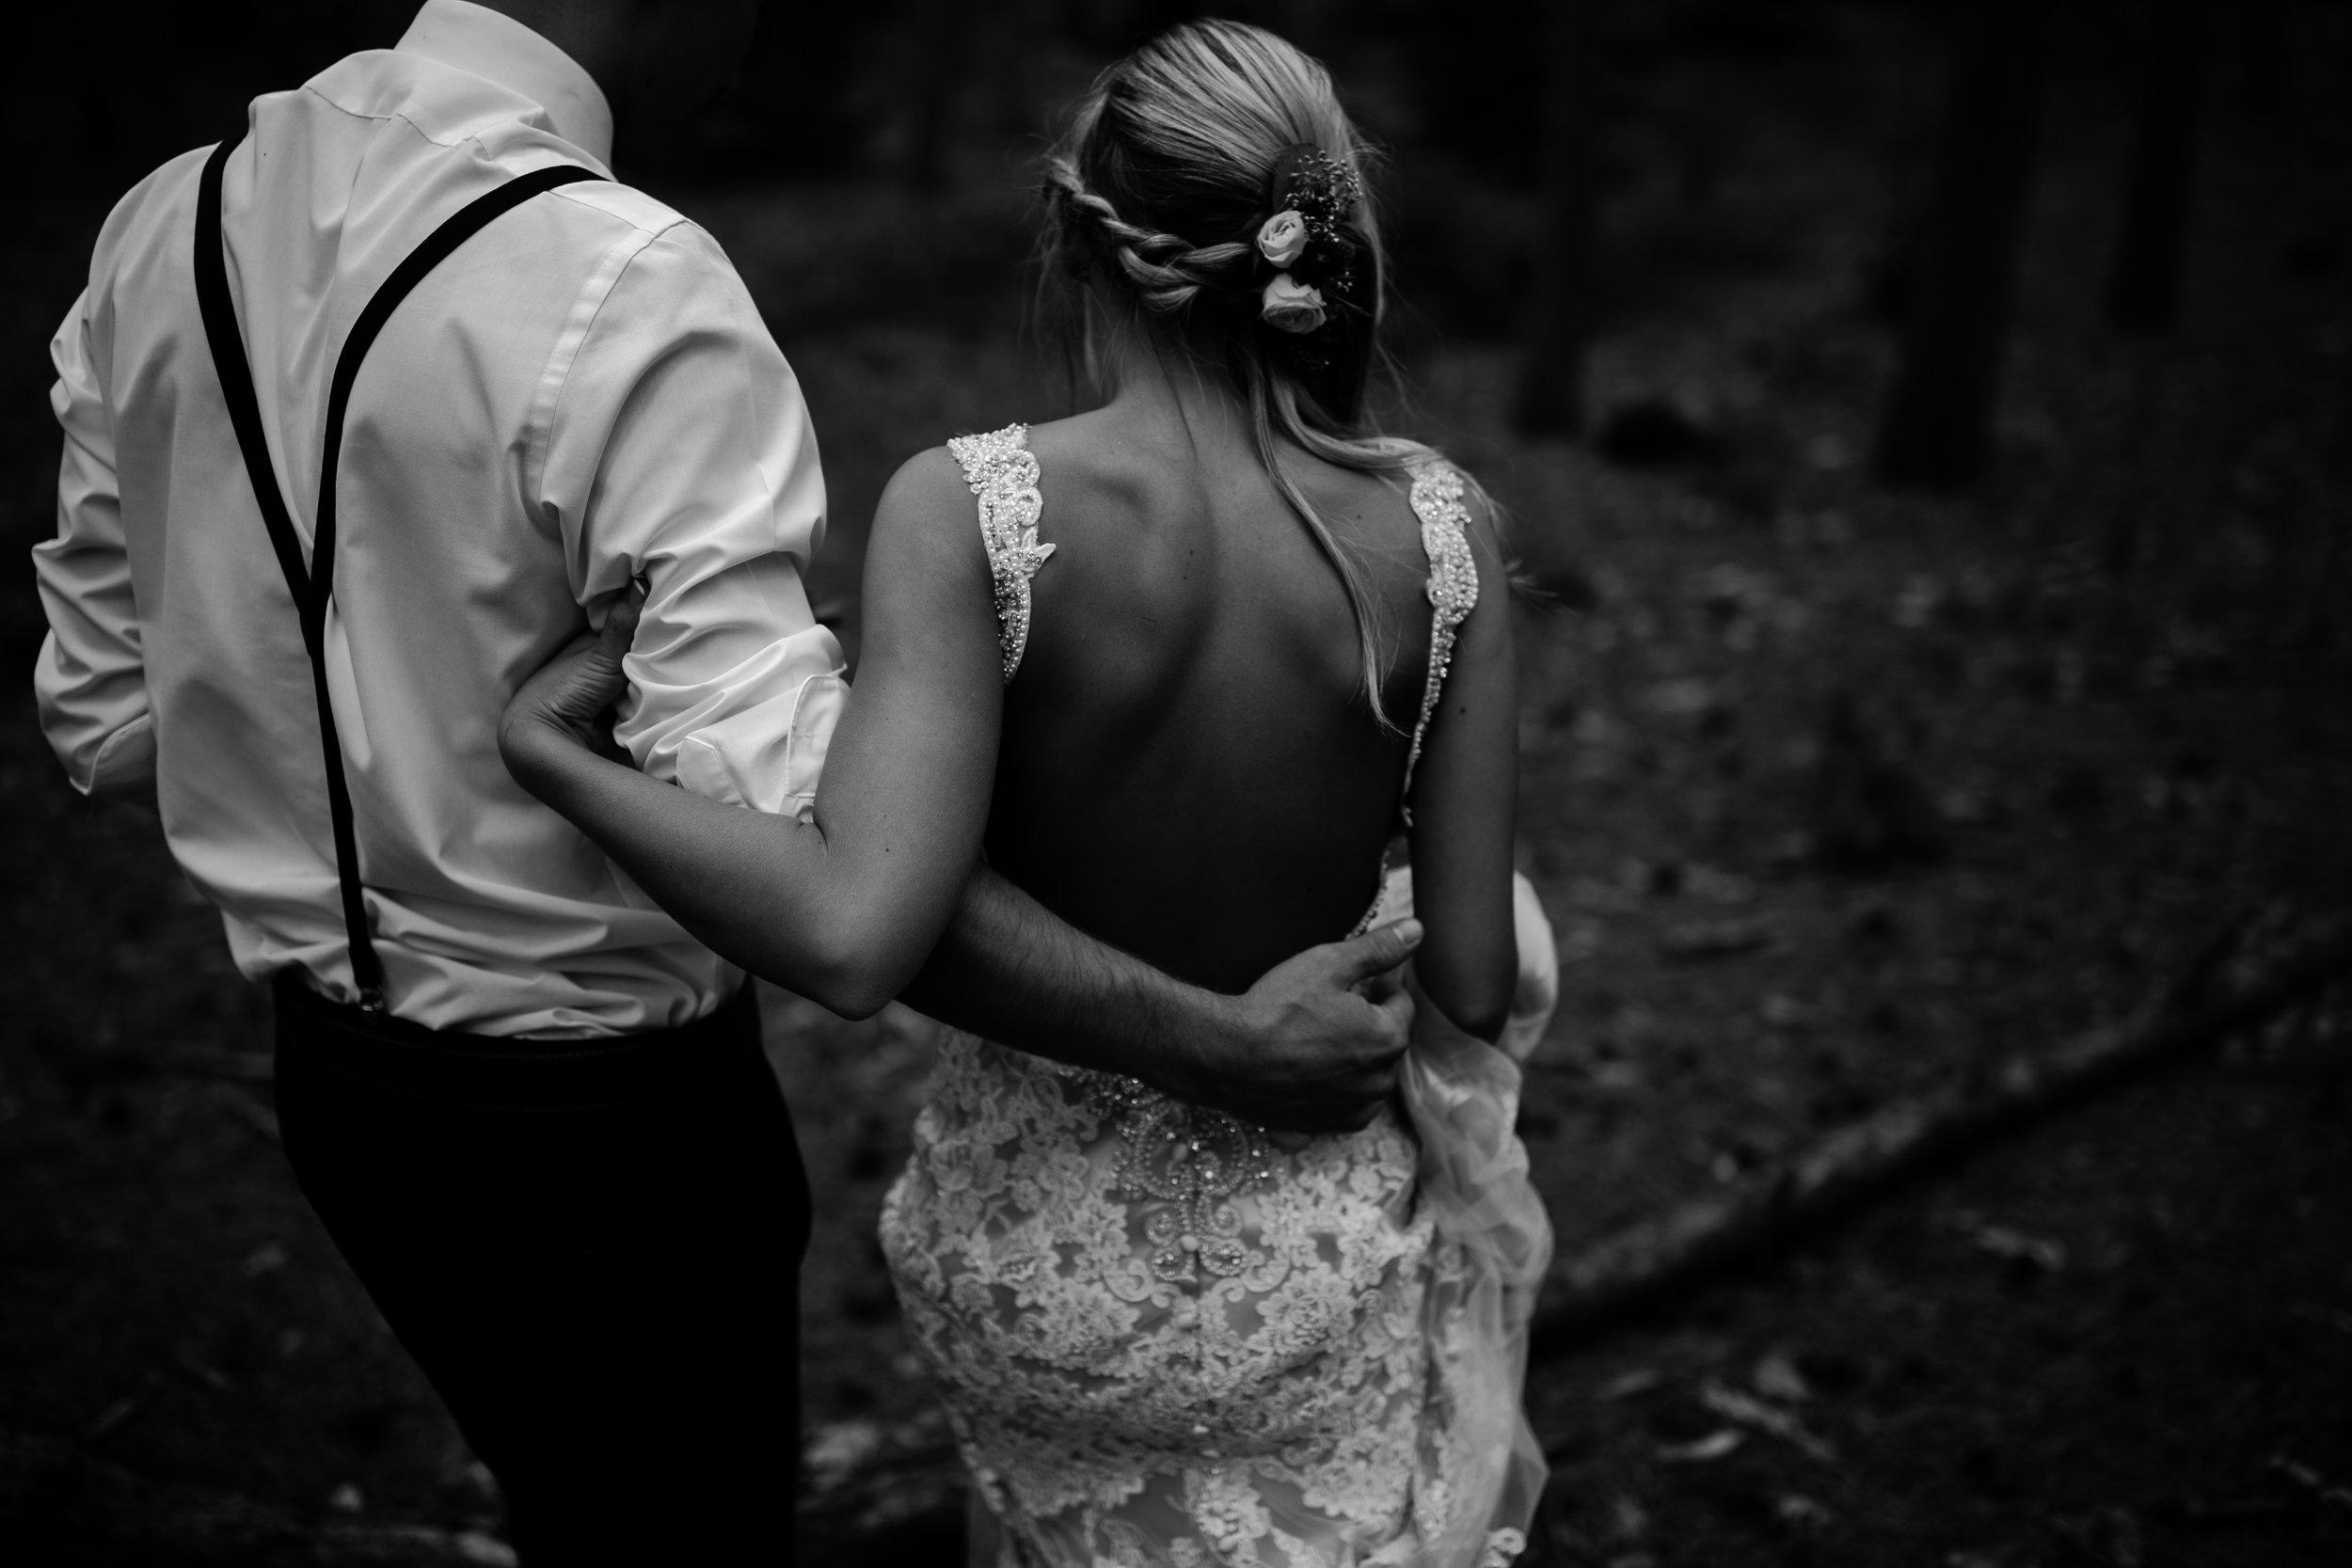 west-michigan-wedding-photographer-whitehall-rachel-austin-chapel-in-the-pines-580.jpg